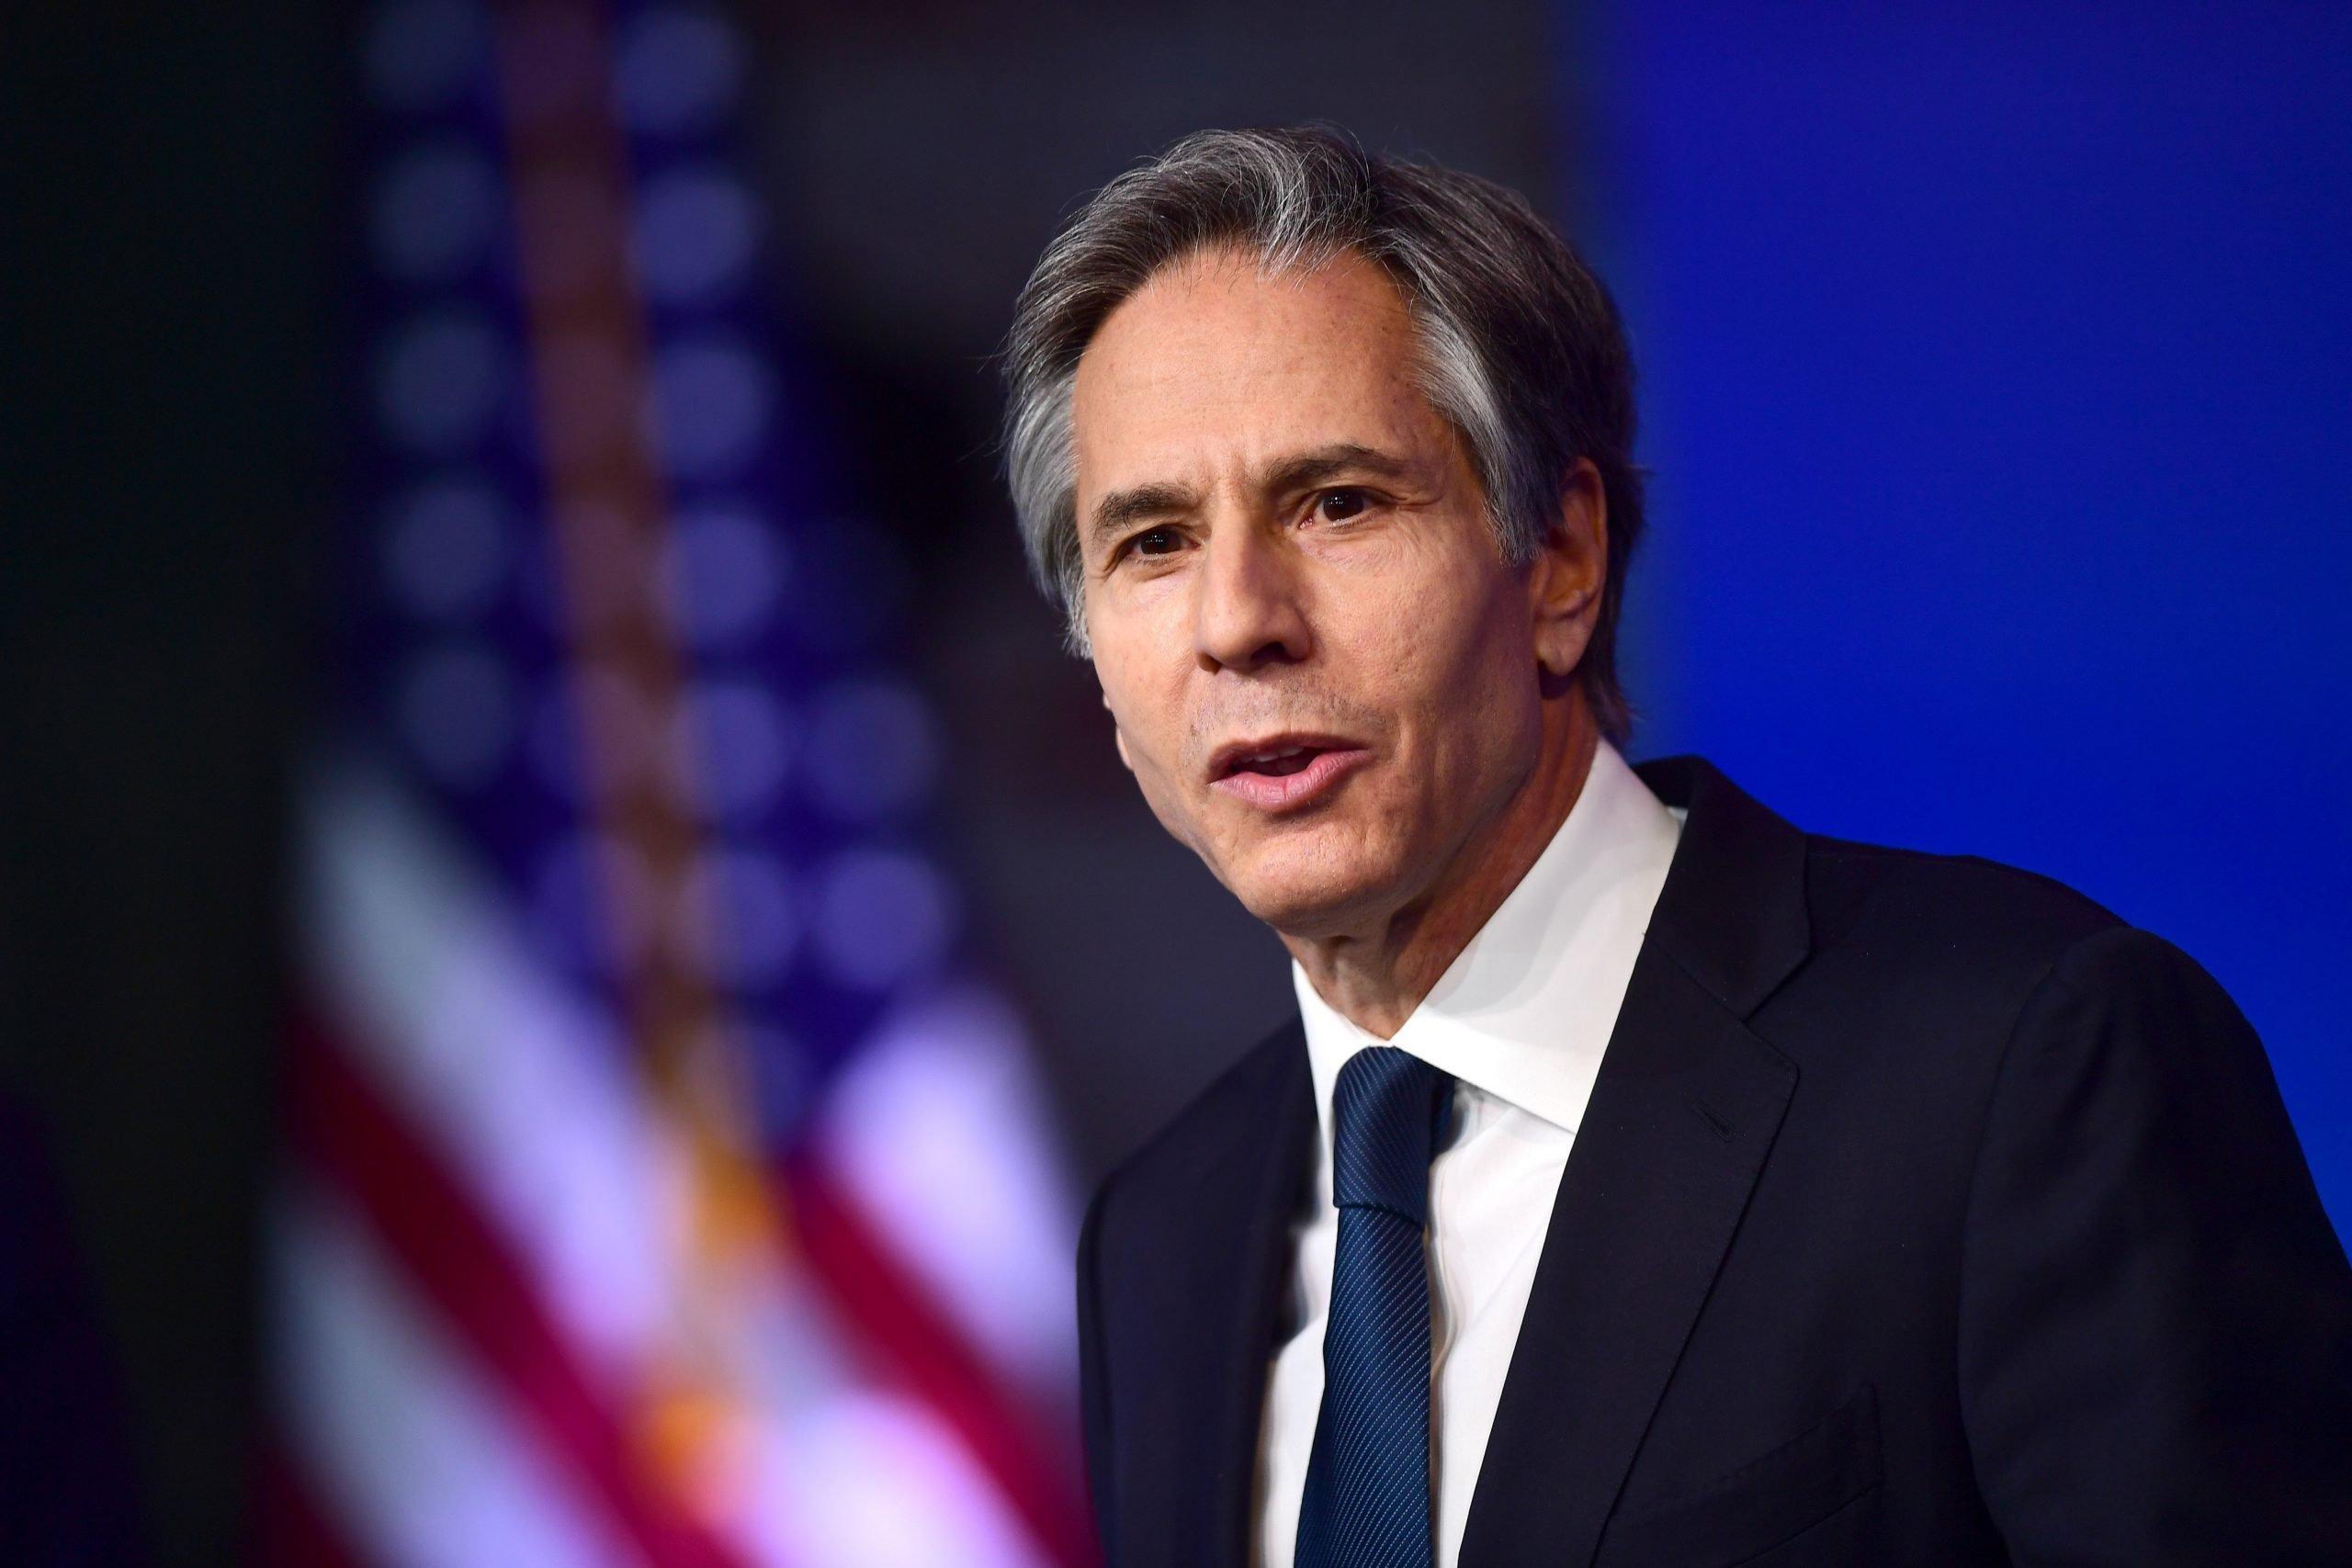 Blinken plans to visit Ukraine in May - CNN